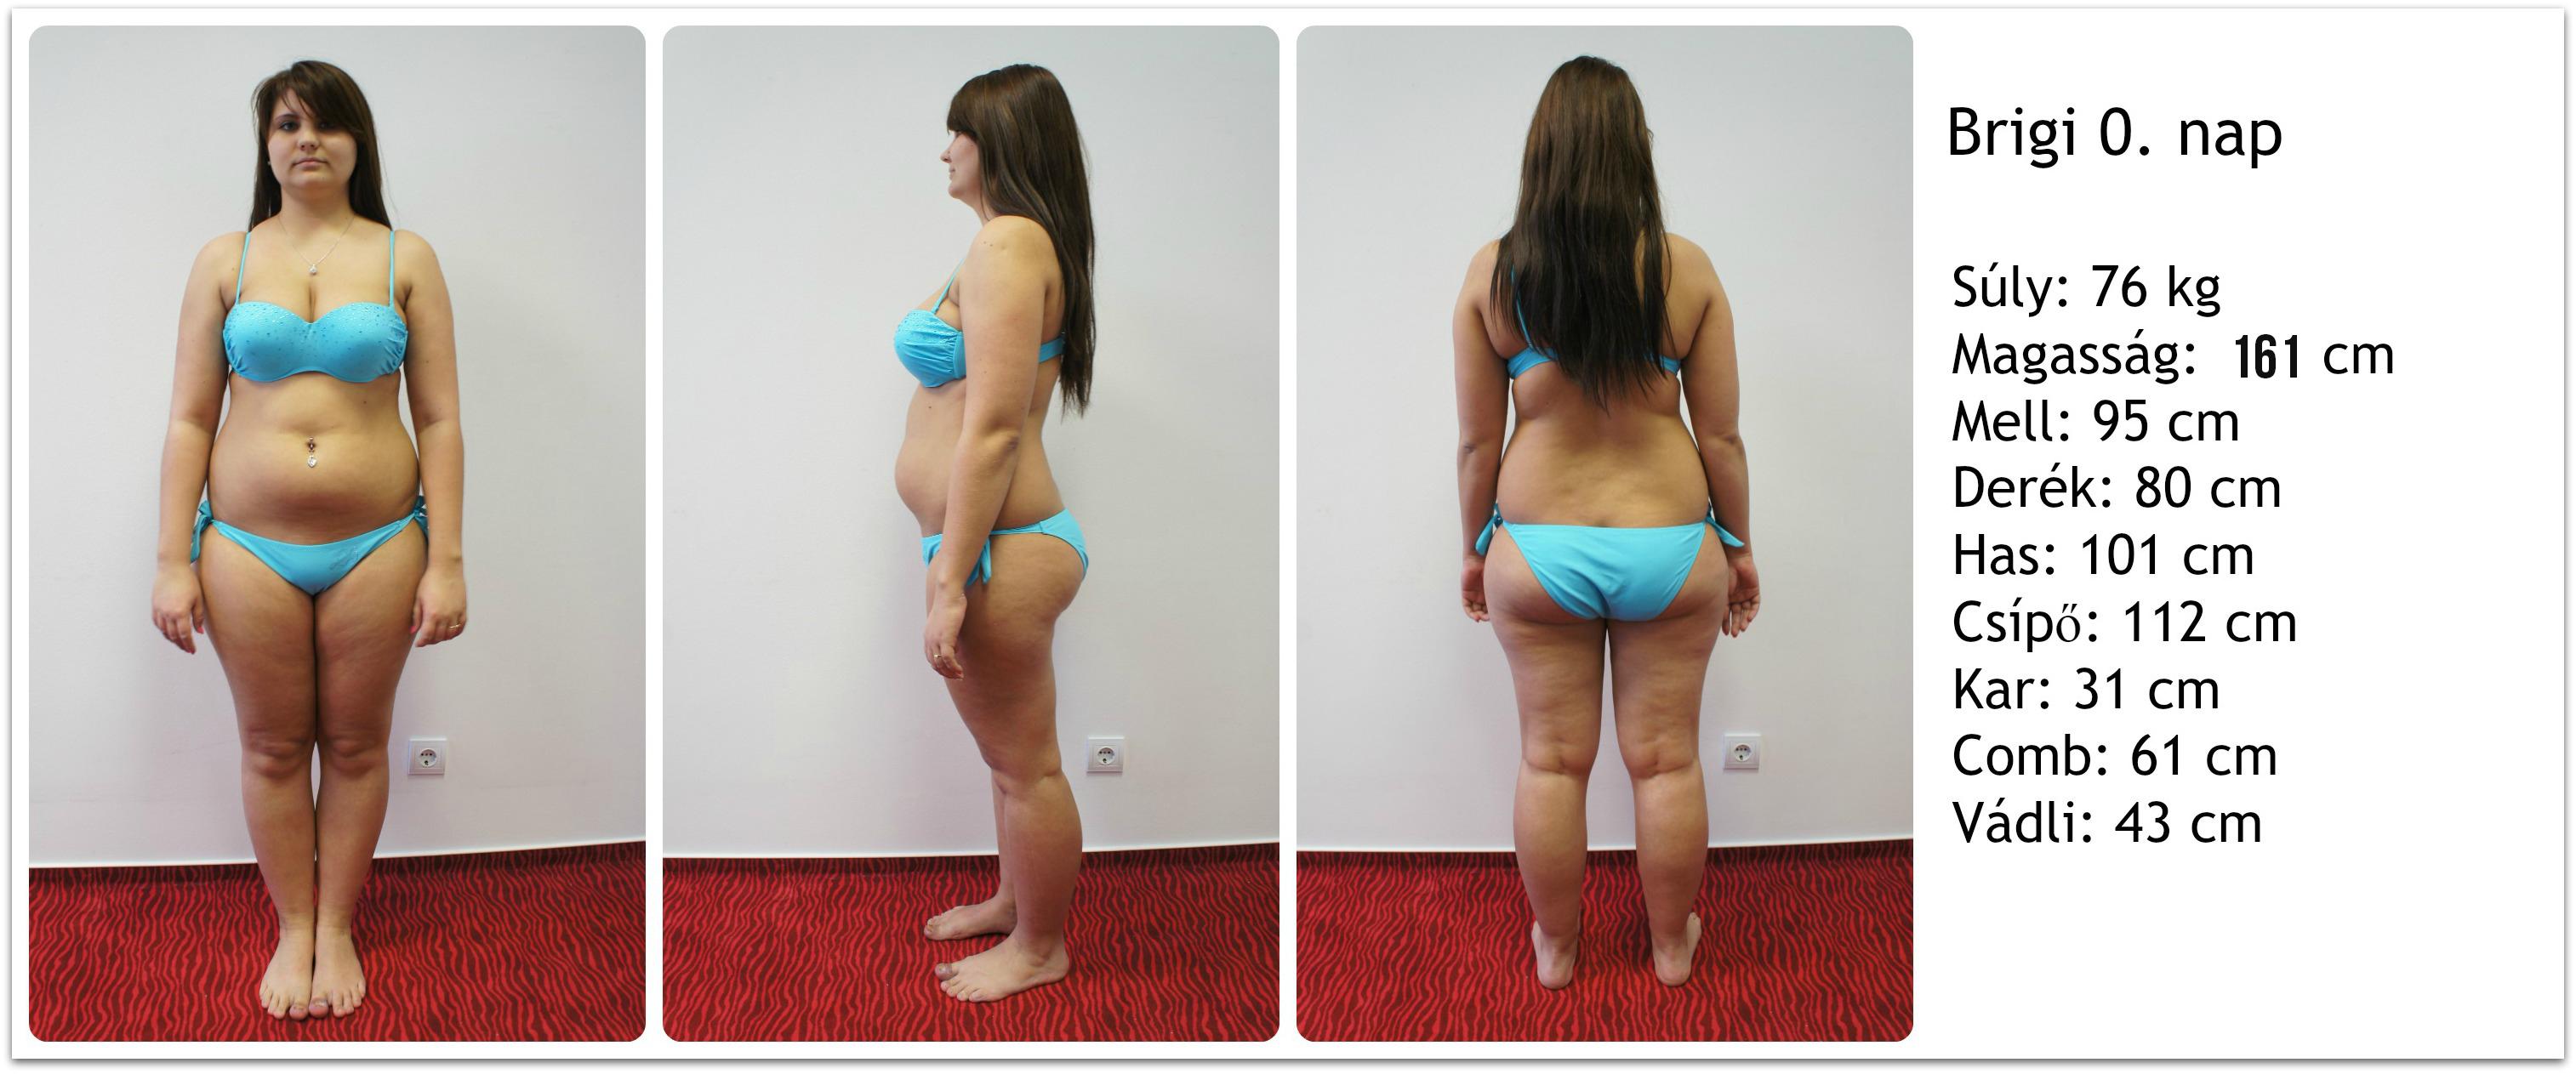 Viven Peak Girl kg 3 hónap alatt! Neked is menni fog a diéta! | Peak girl